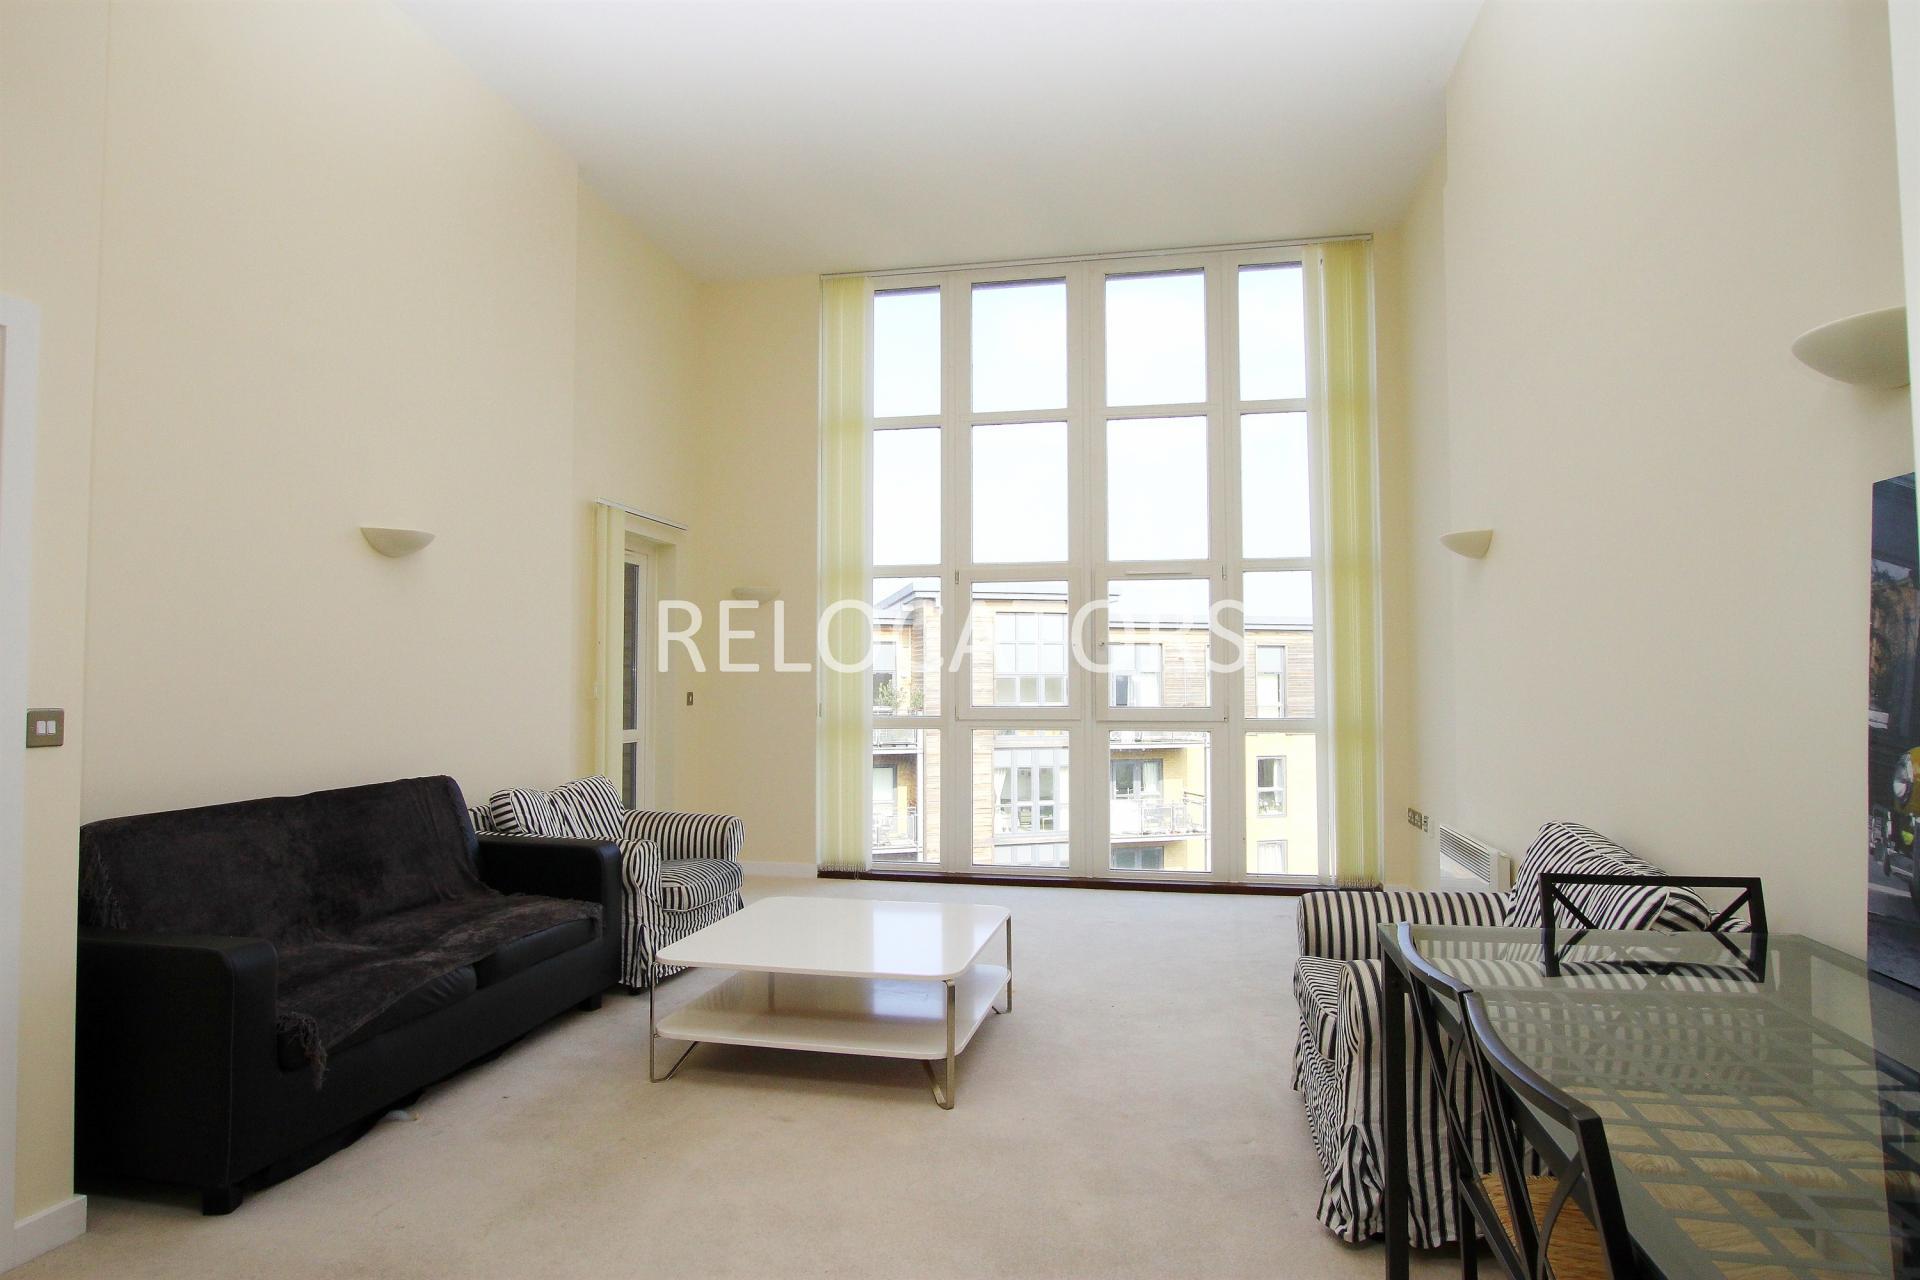 2 Bedroom Flat For Sale In London